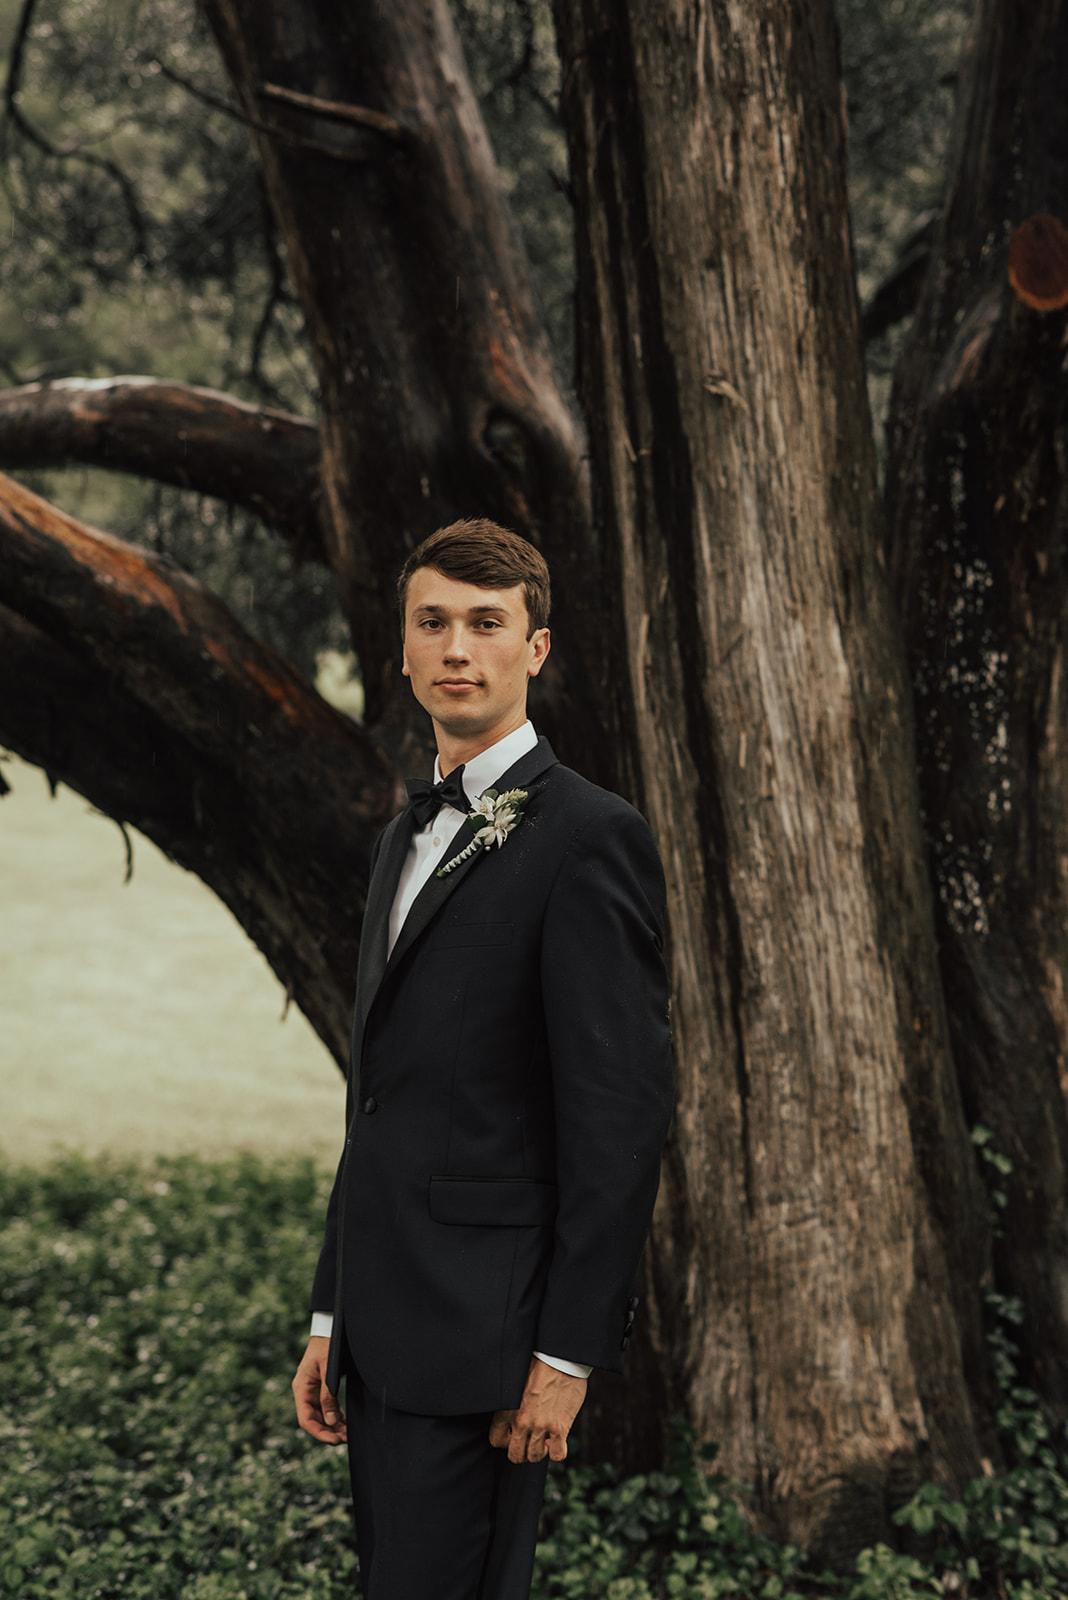 Richmond VA Wedding By SB Photographs077.jpg